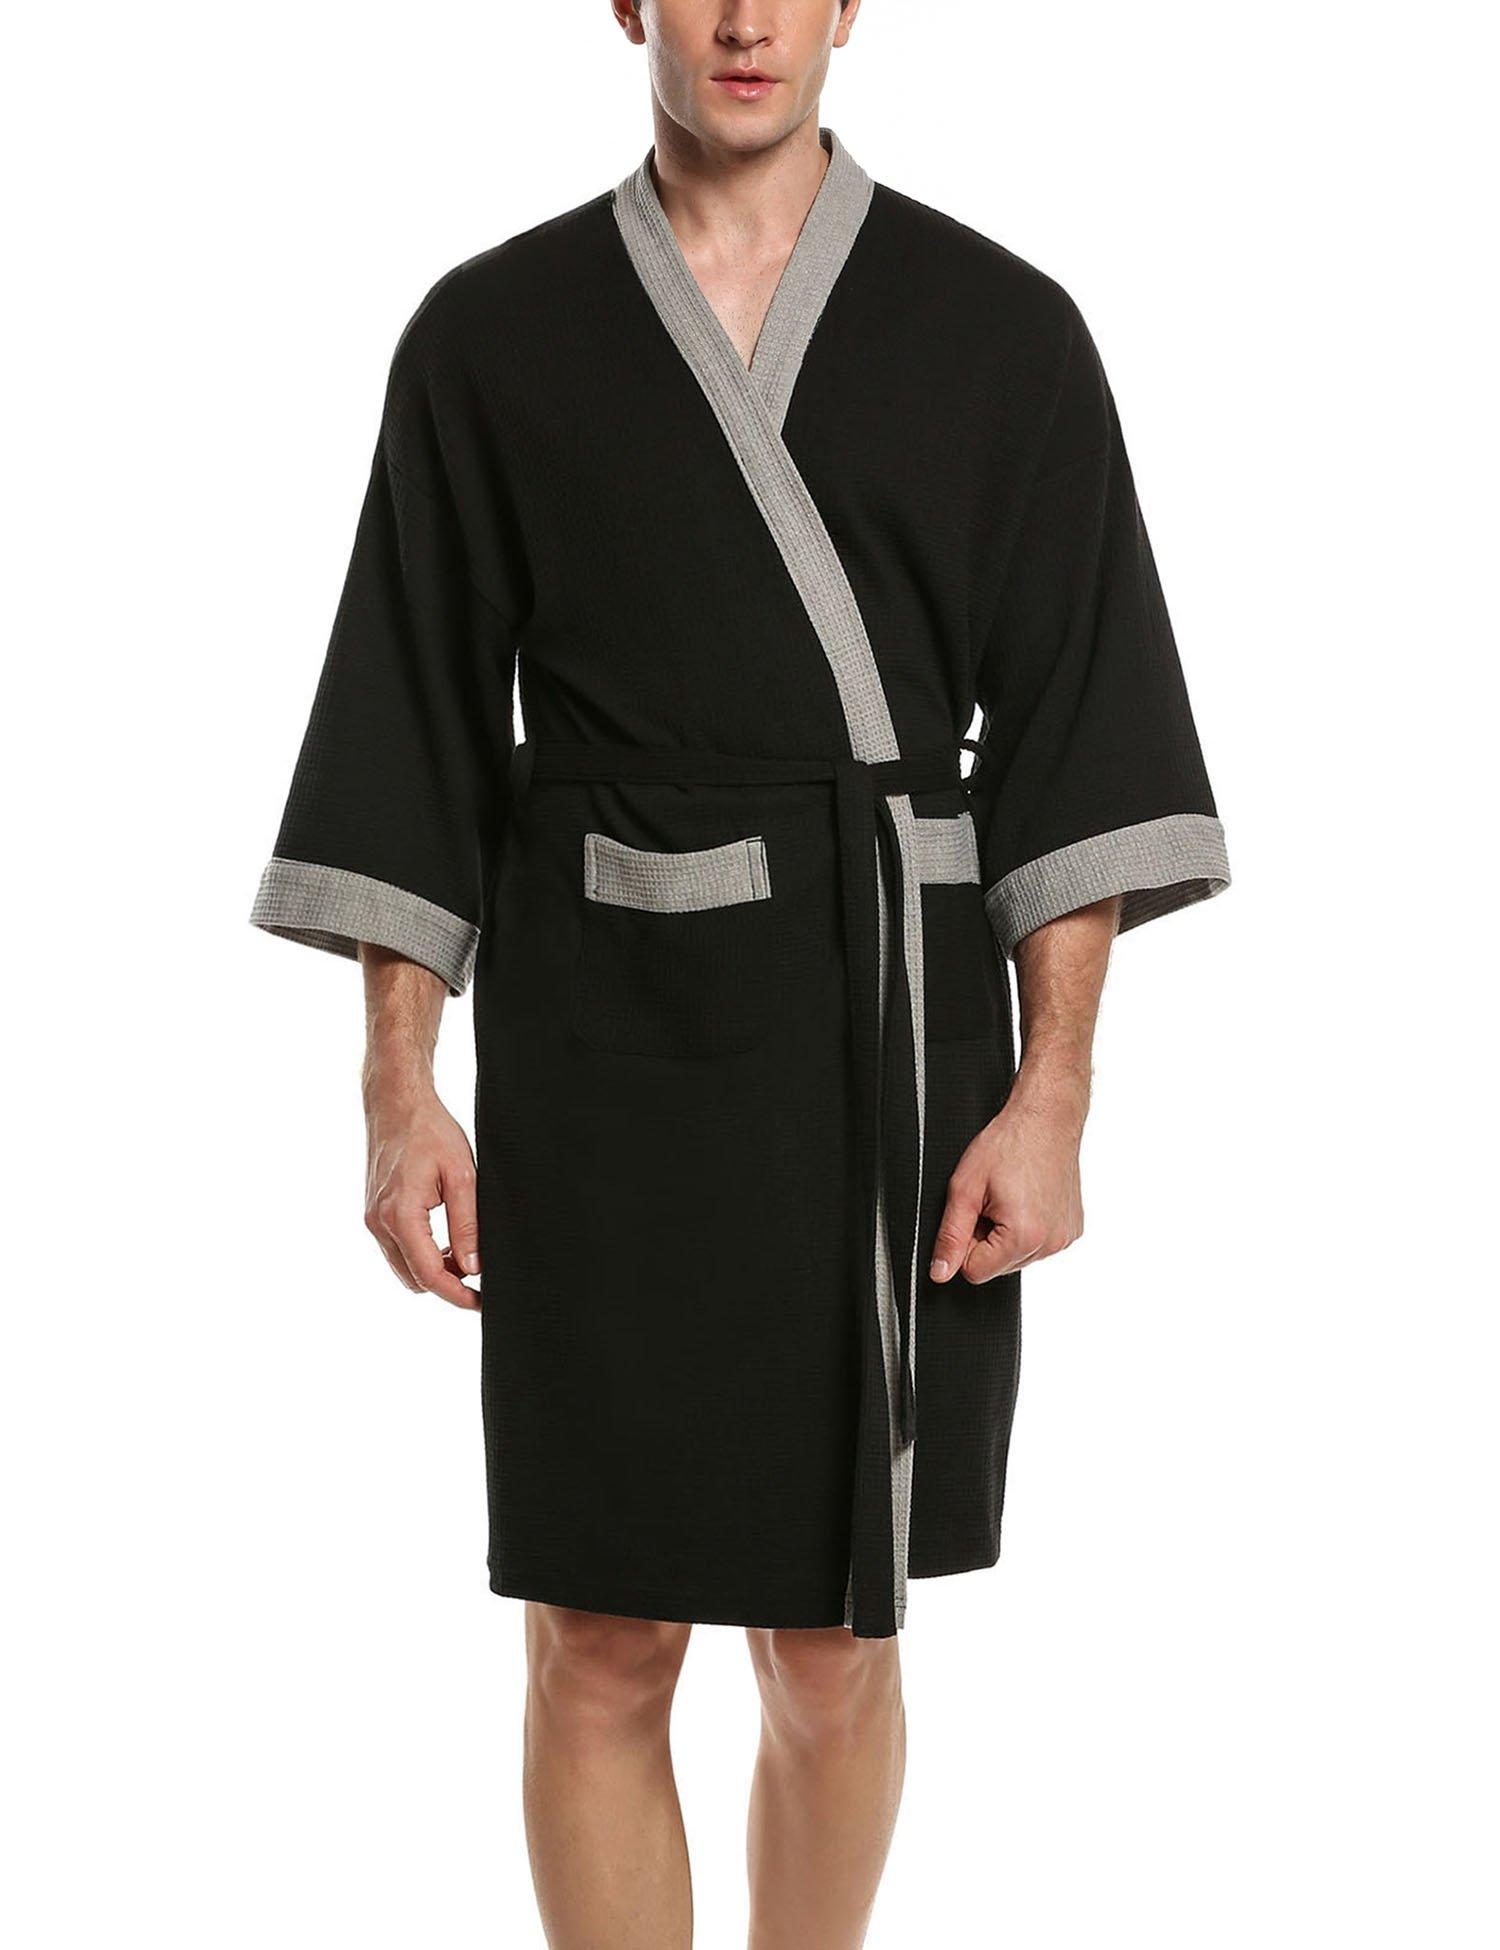 HOTOUCH Men's Cotton Robe, Lightweight Woven Bathrobe Black Grey XL